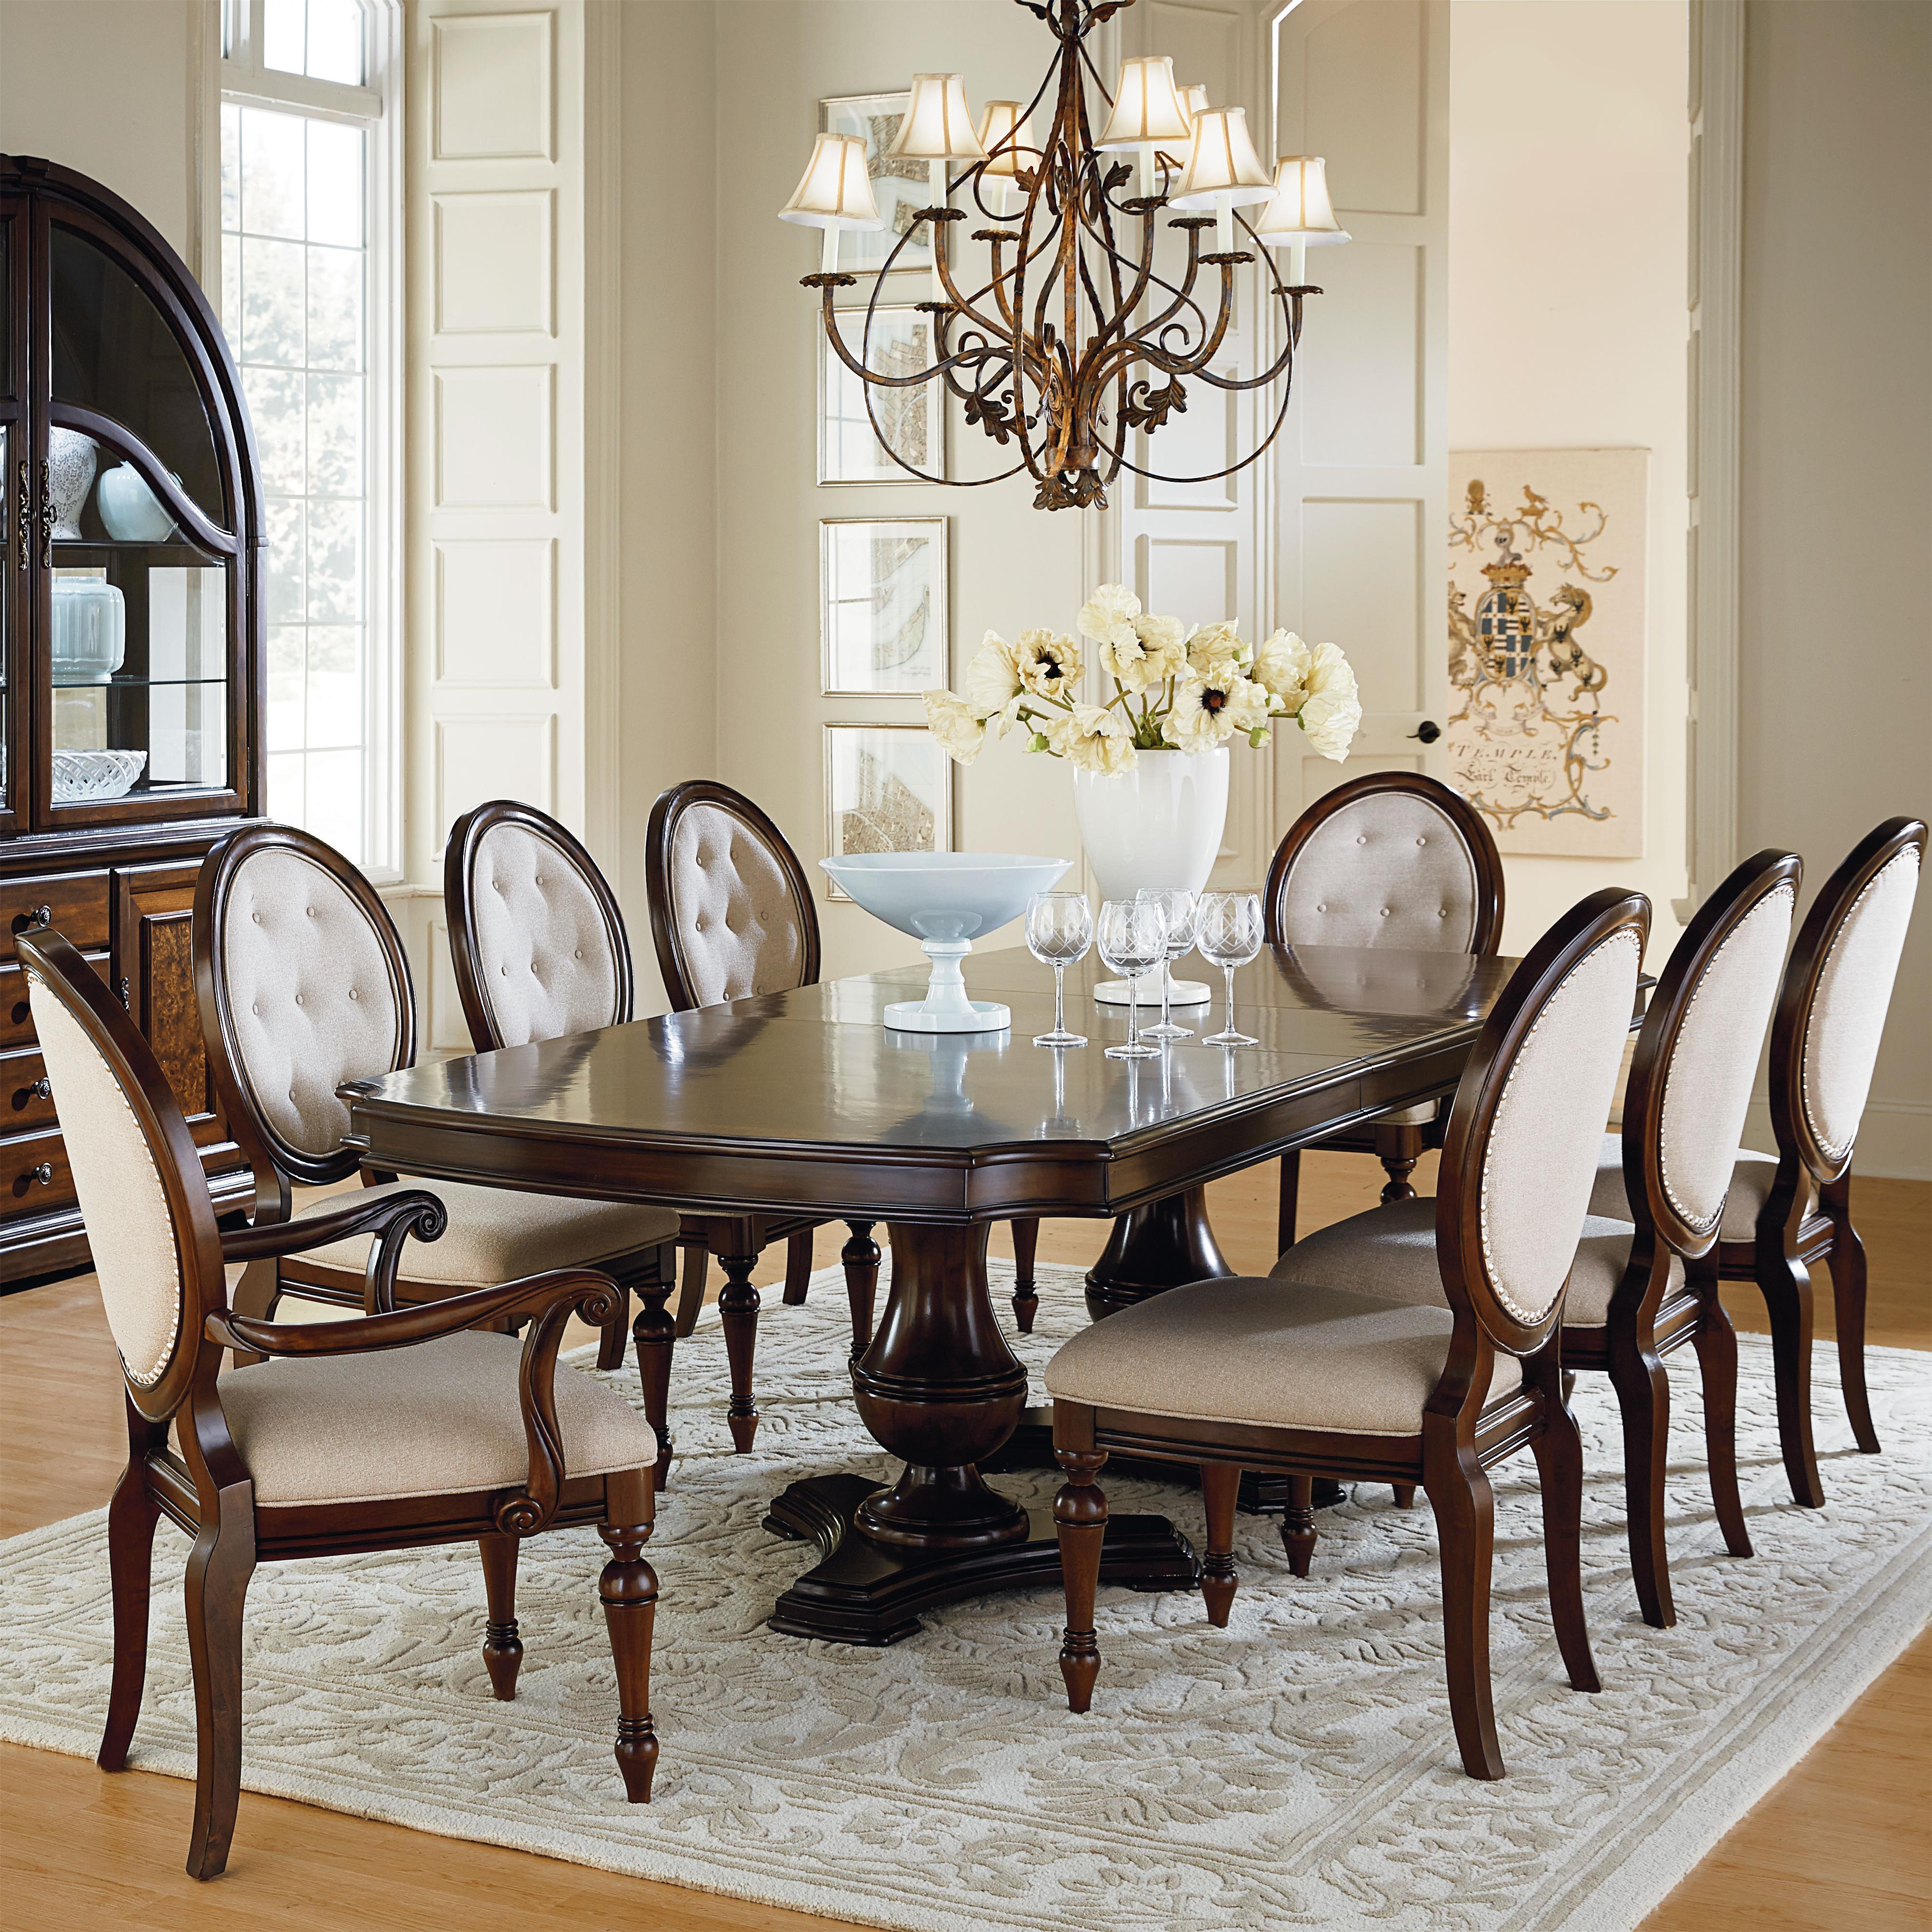 Standard Furniture Carrington Dining Dining Room Set - Item Number: 17026+2017026+6x17024+2x25